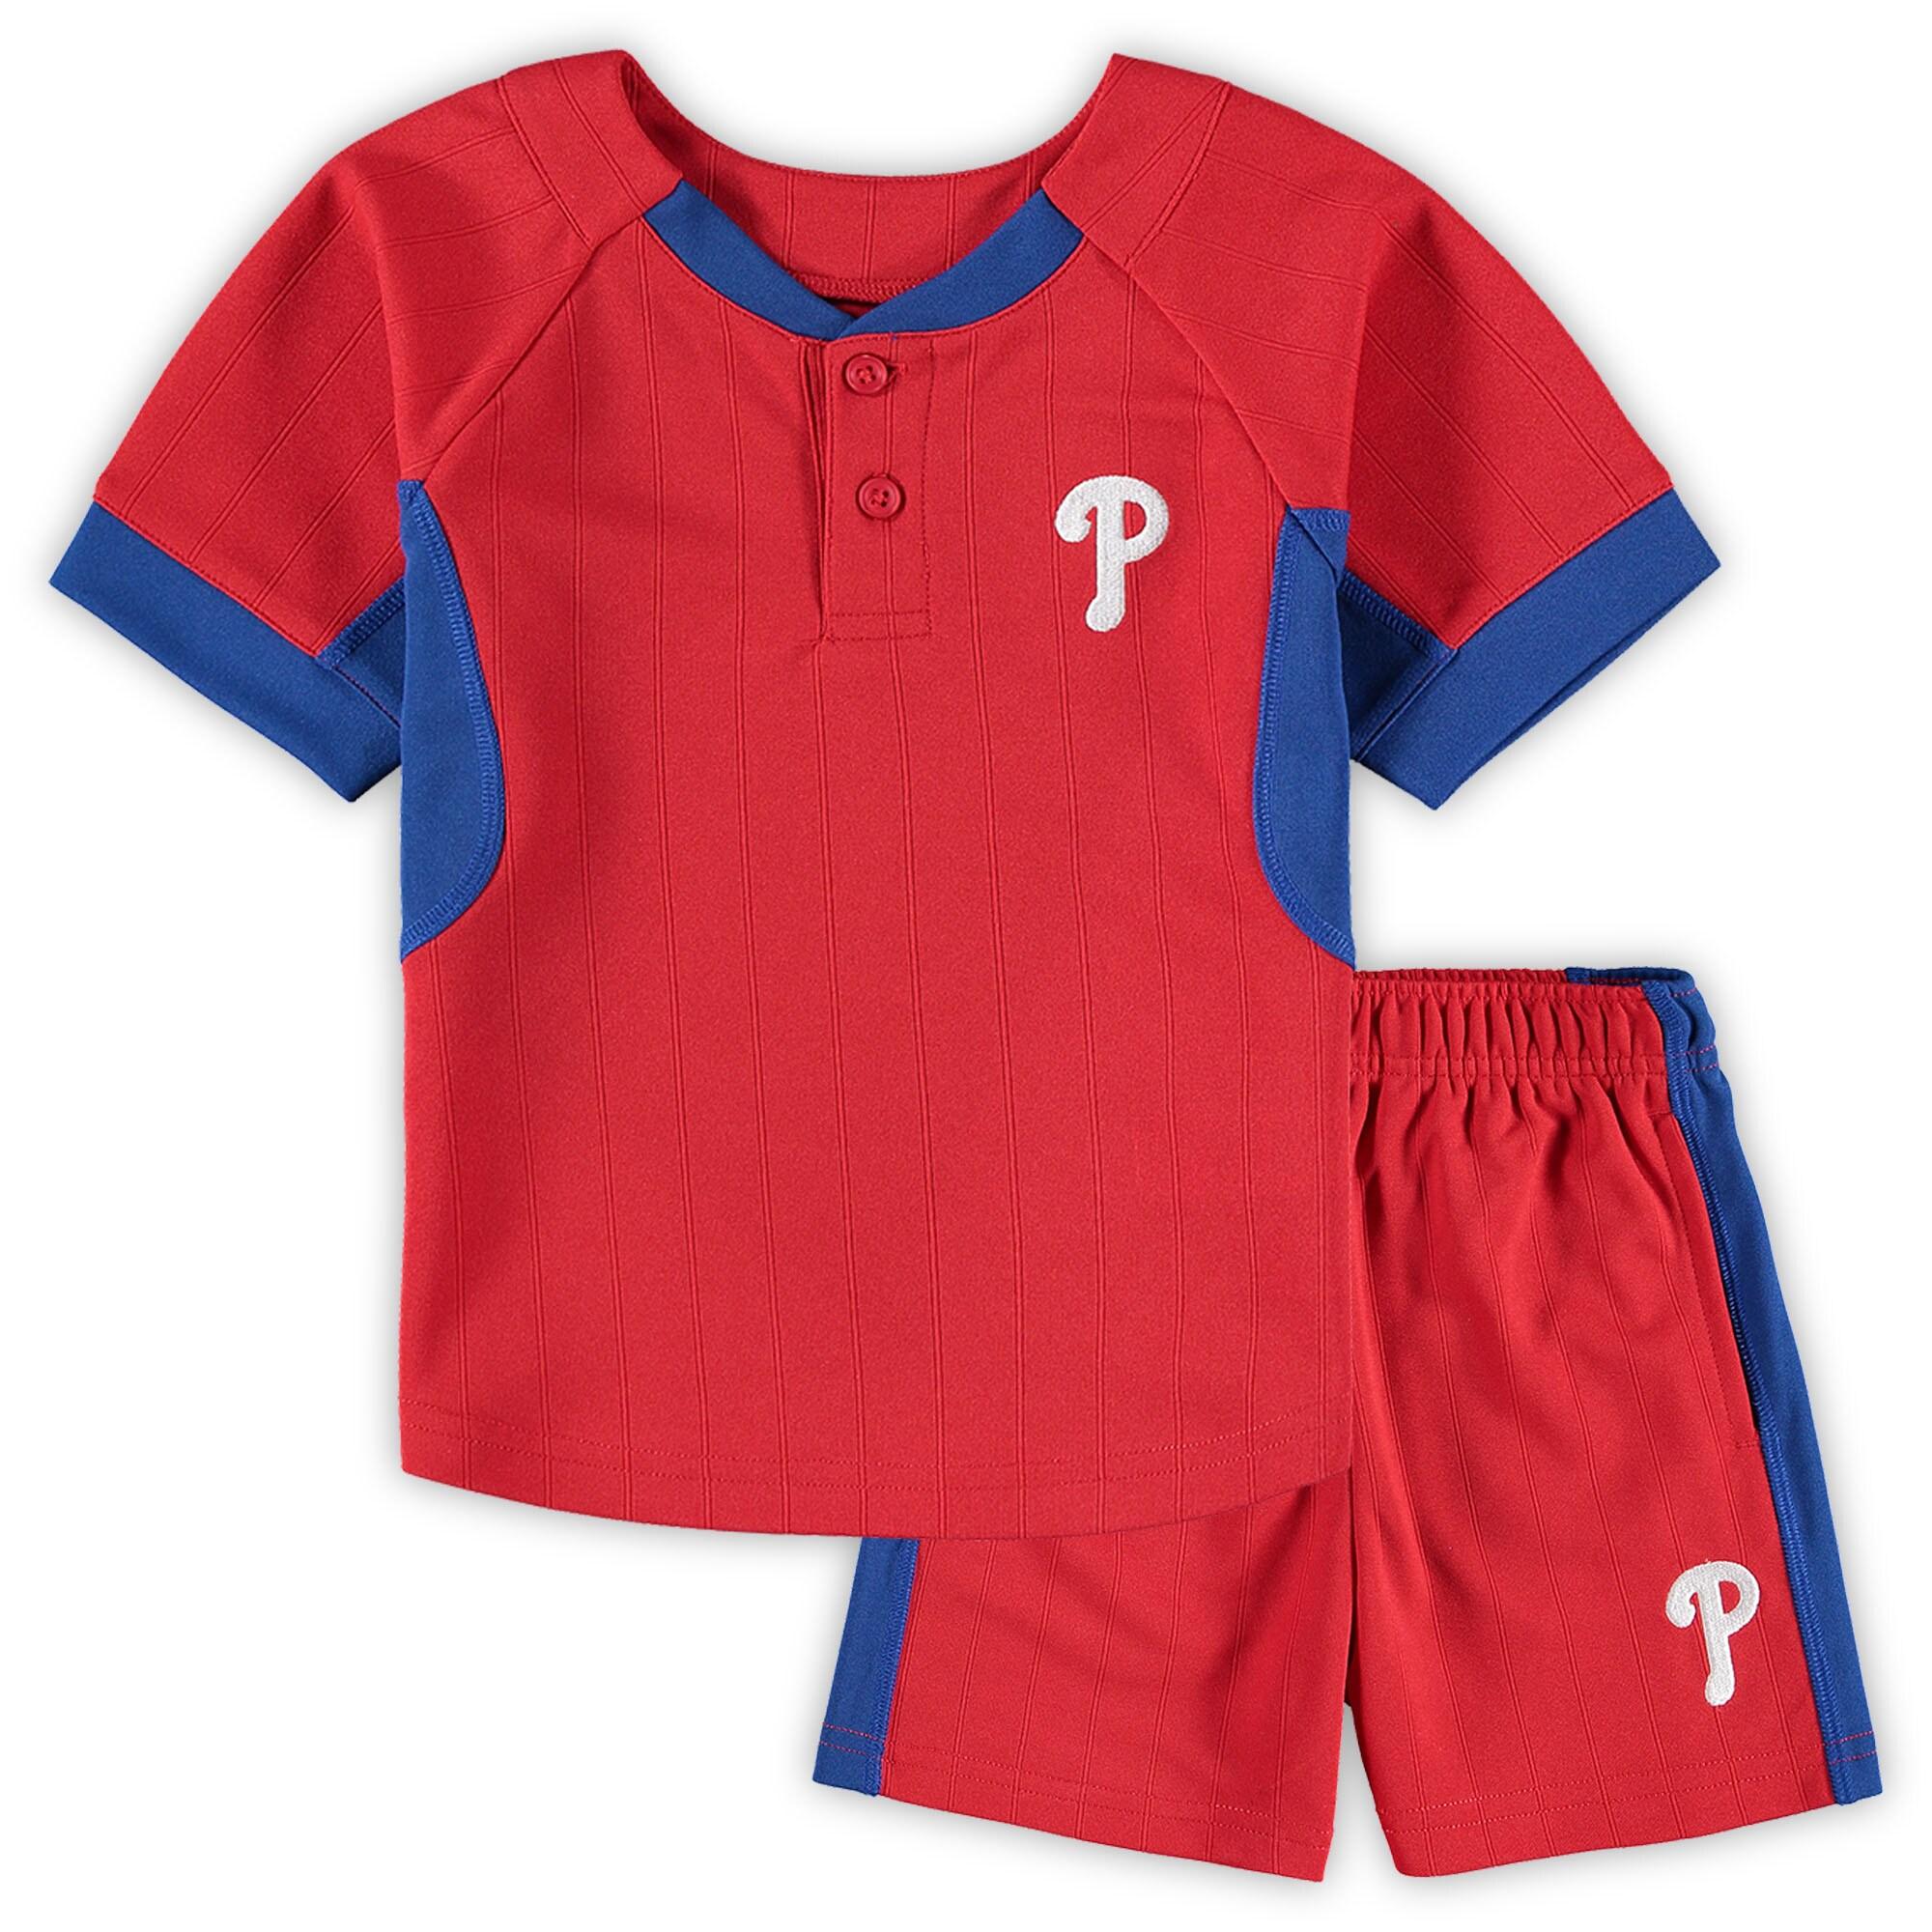 Philadelphia Phillies Toddler The Windup T-Shirt & Shorts Set - Red